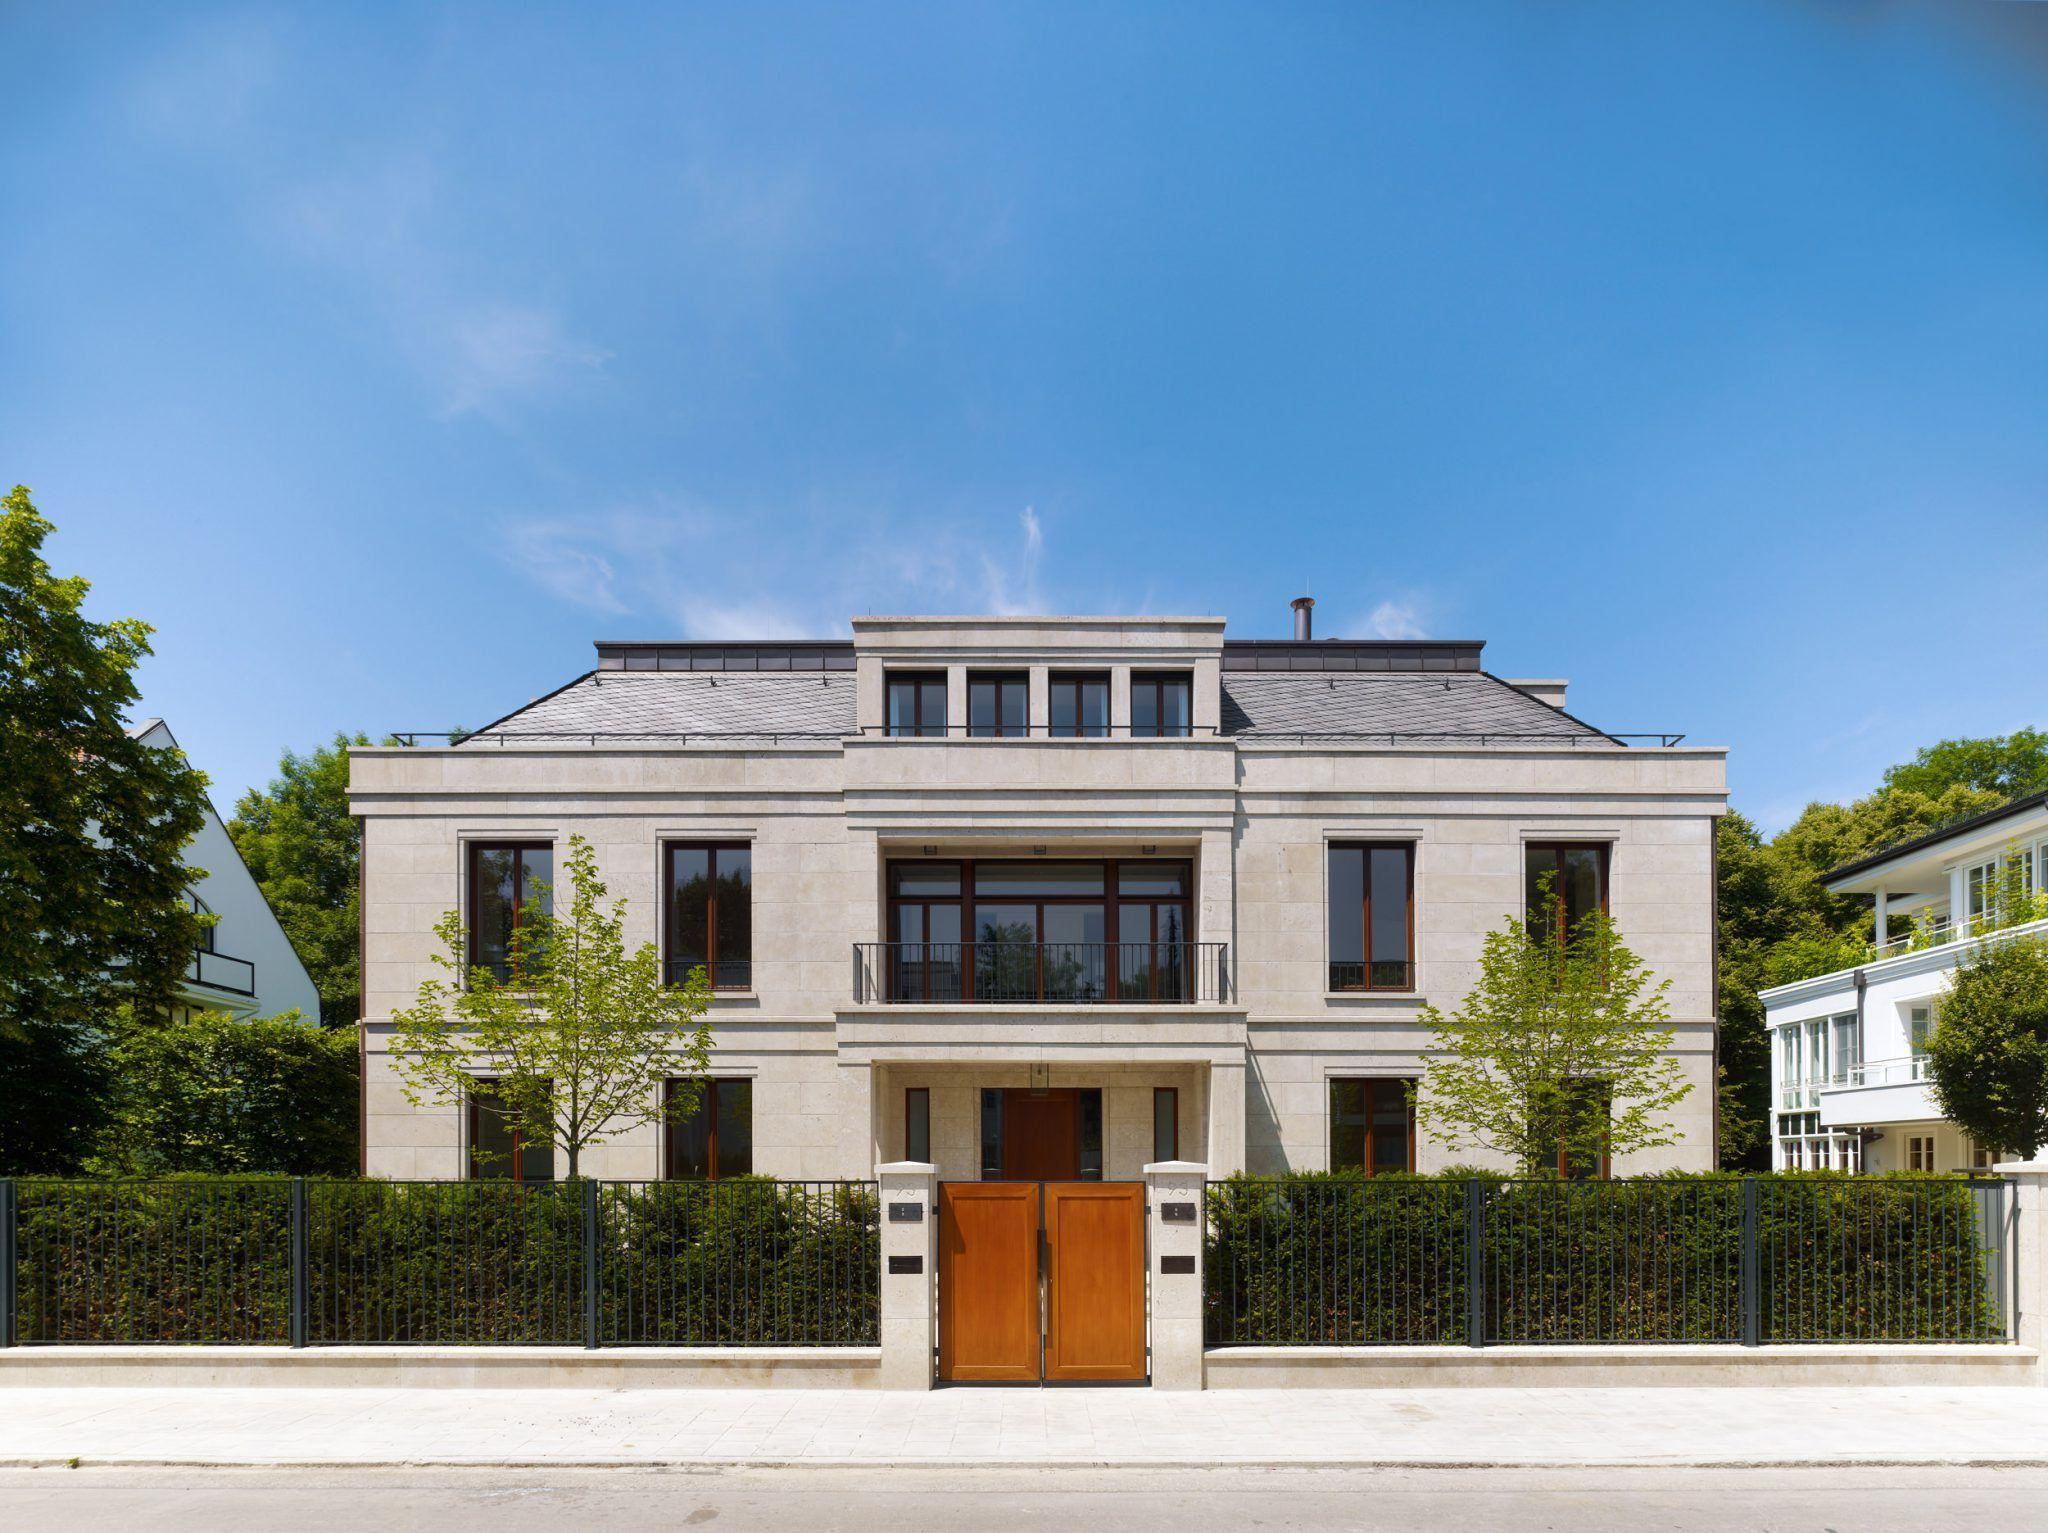 petra and paul kahlfeldt architects pinterest drau en. Black Bedroom Furniture Sets. Home Design Ideas